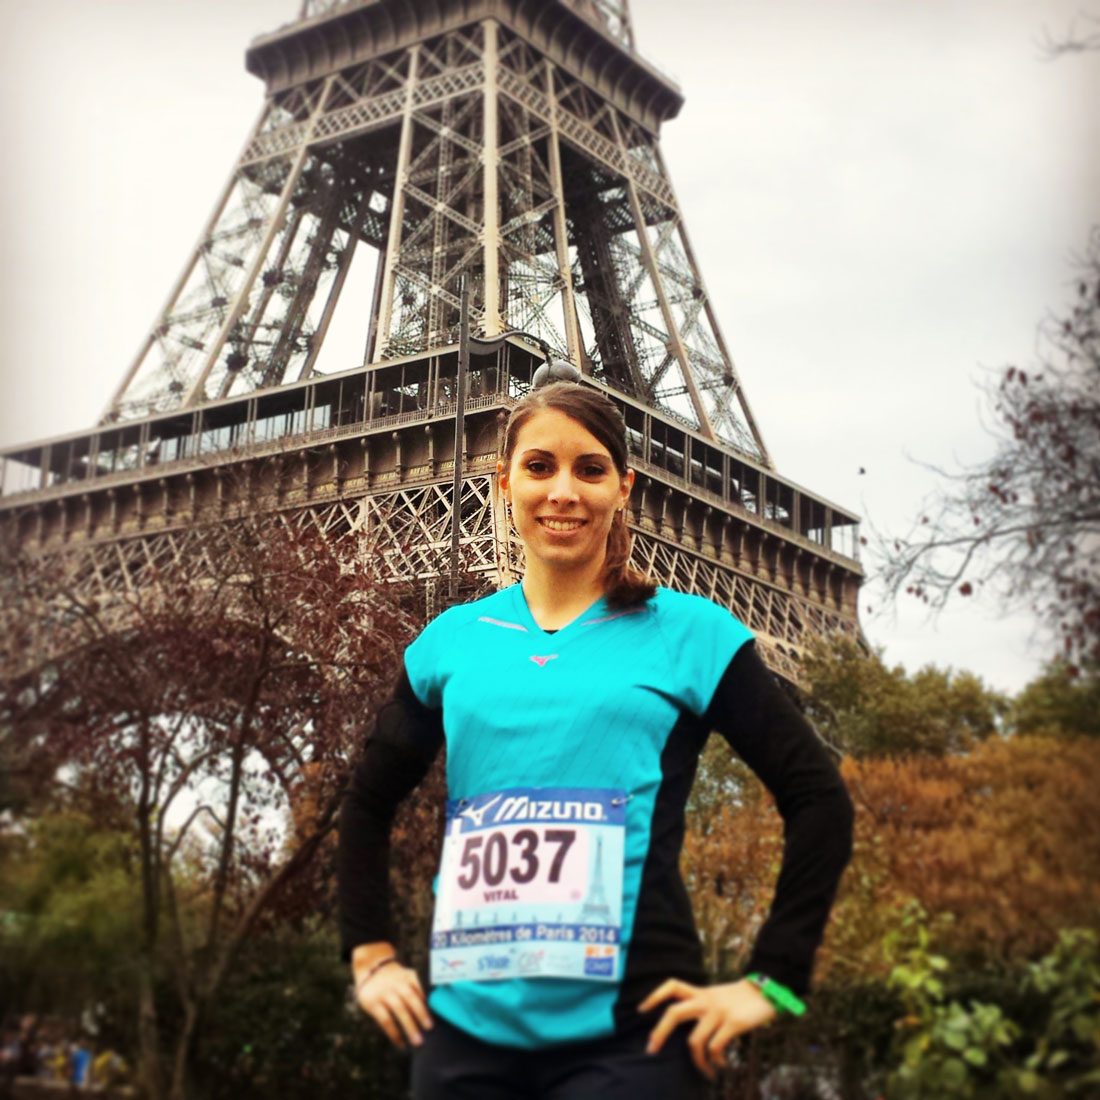 La journaliste Elodie Sillaro au 20 km de Paris, 12 10 2014.